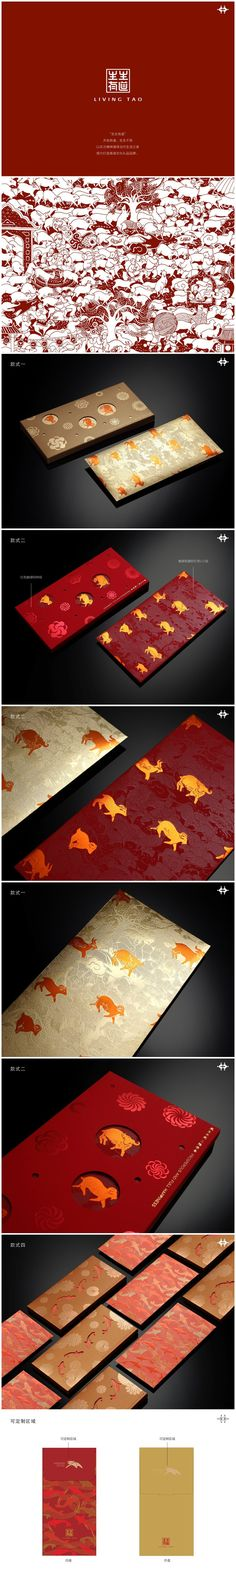 靳刘高文化礼品——生生有道羊年利是封 Ci Design, Pattern Design, Graphic Design, Brand Packaging, Packaging Design, Branding Design, Envelope Design, Red Envelope, Red Packet